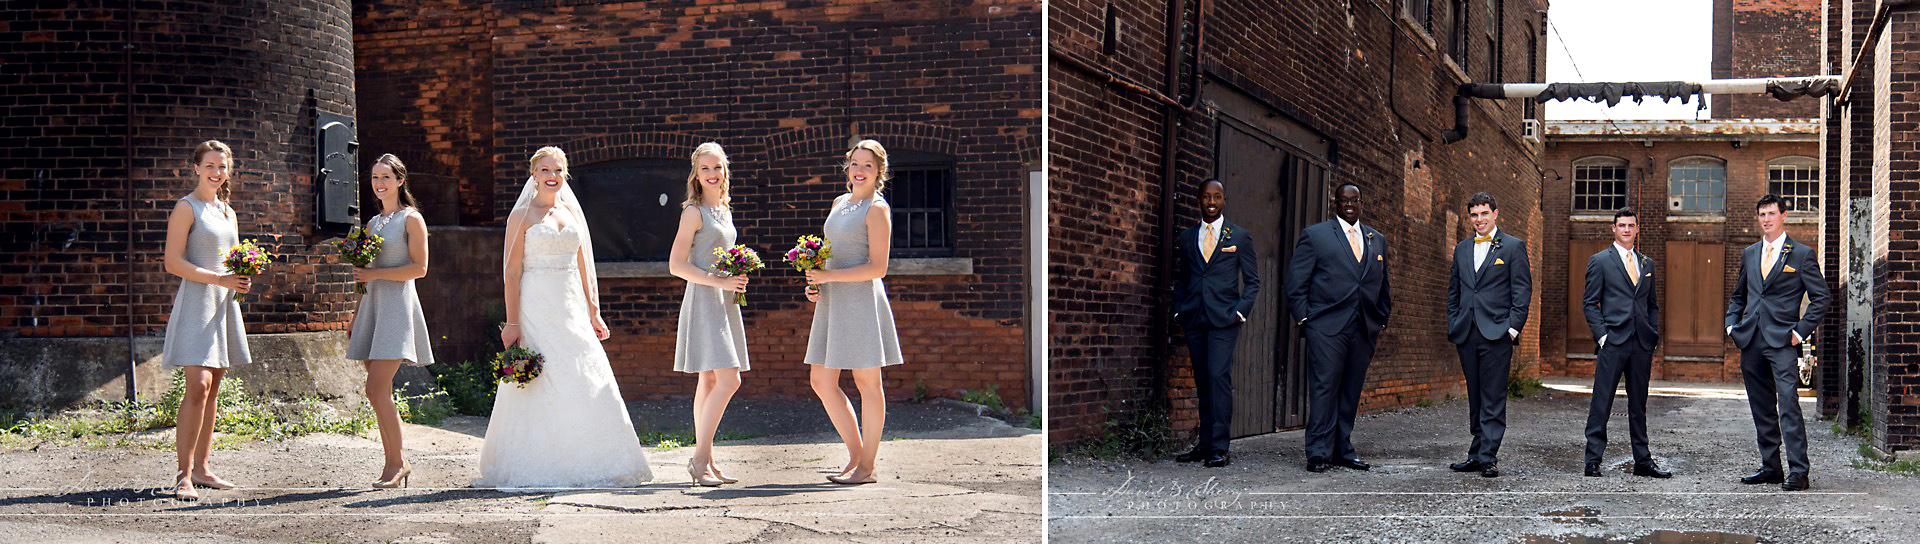 Hamilton_Wedding_Photography_23